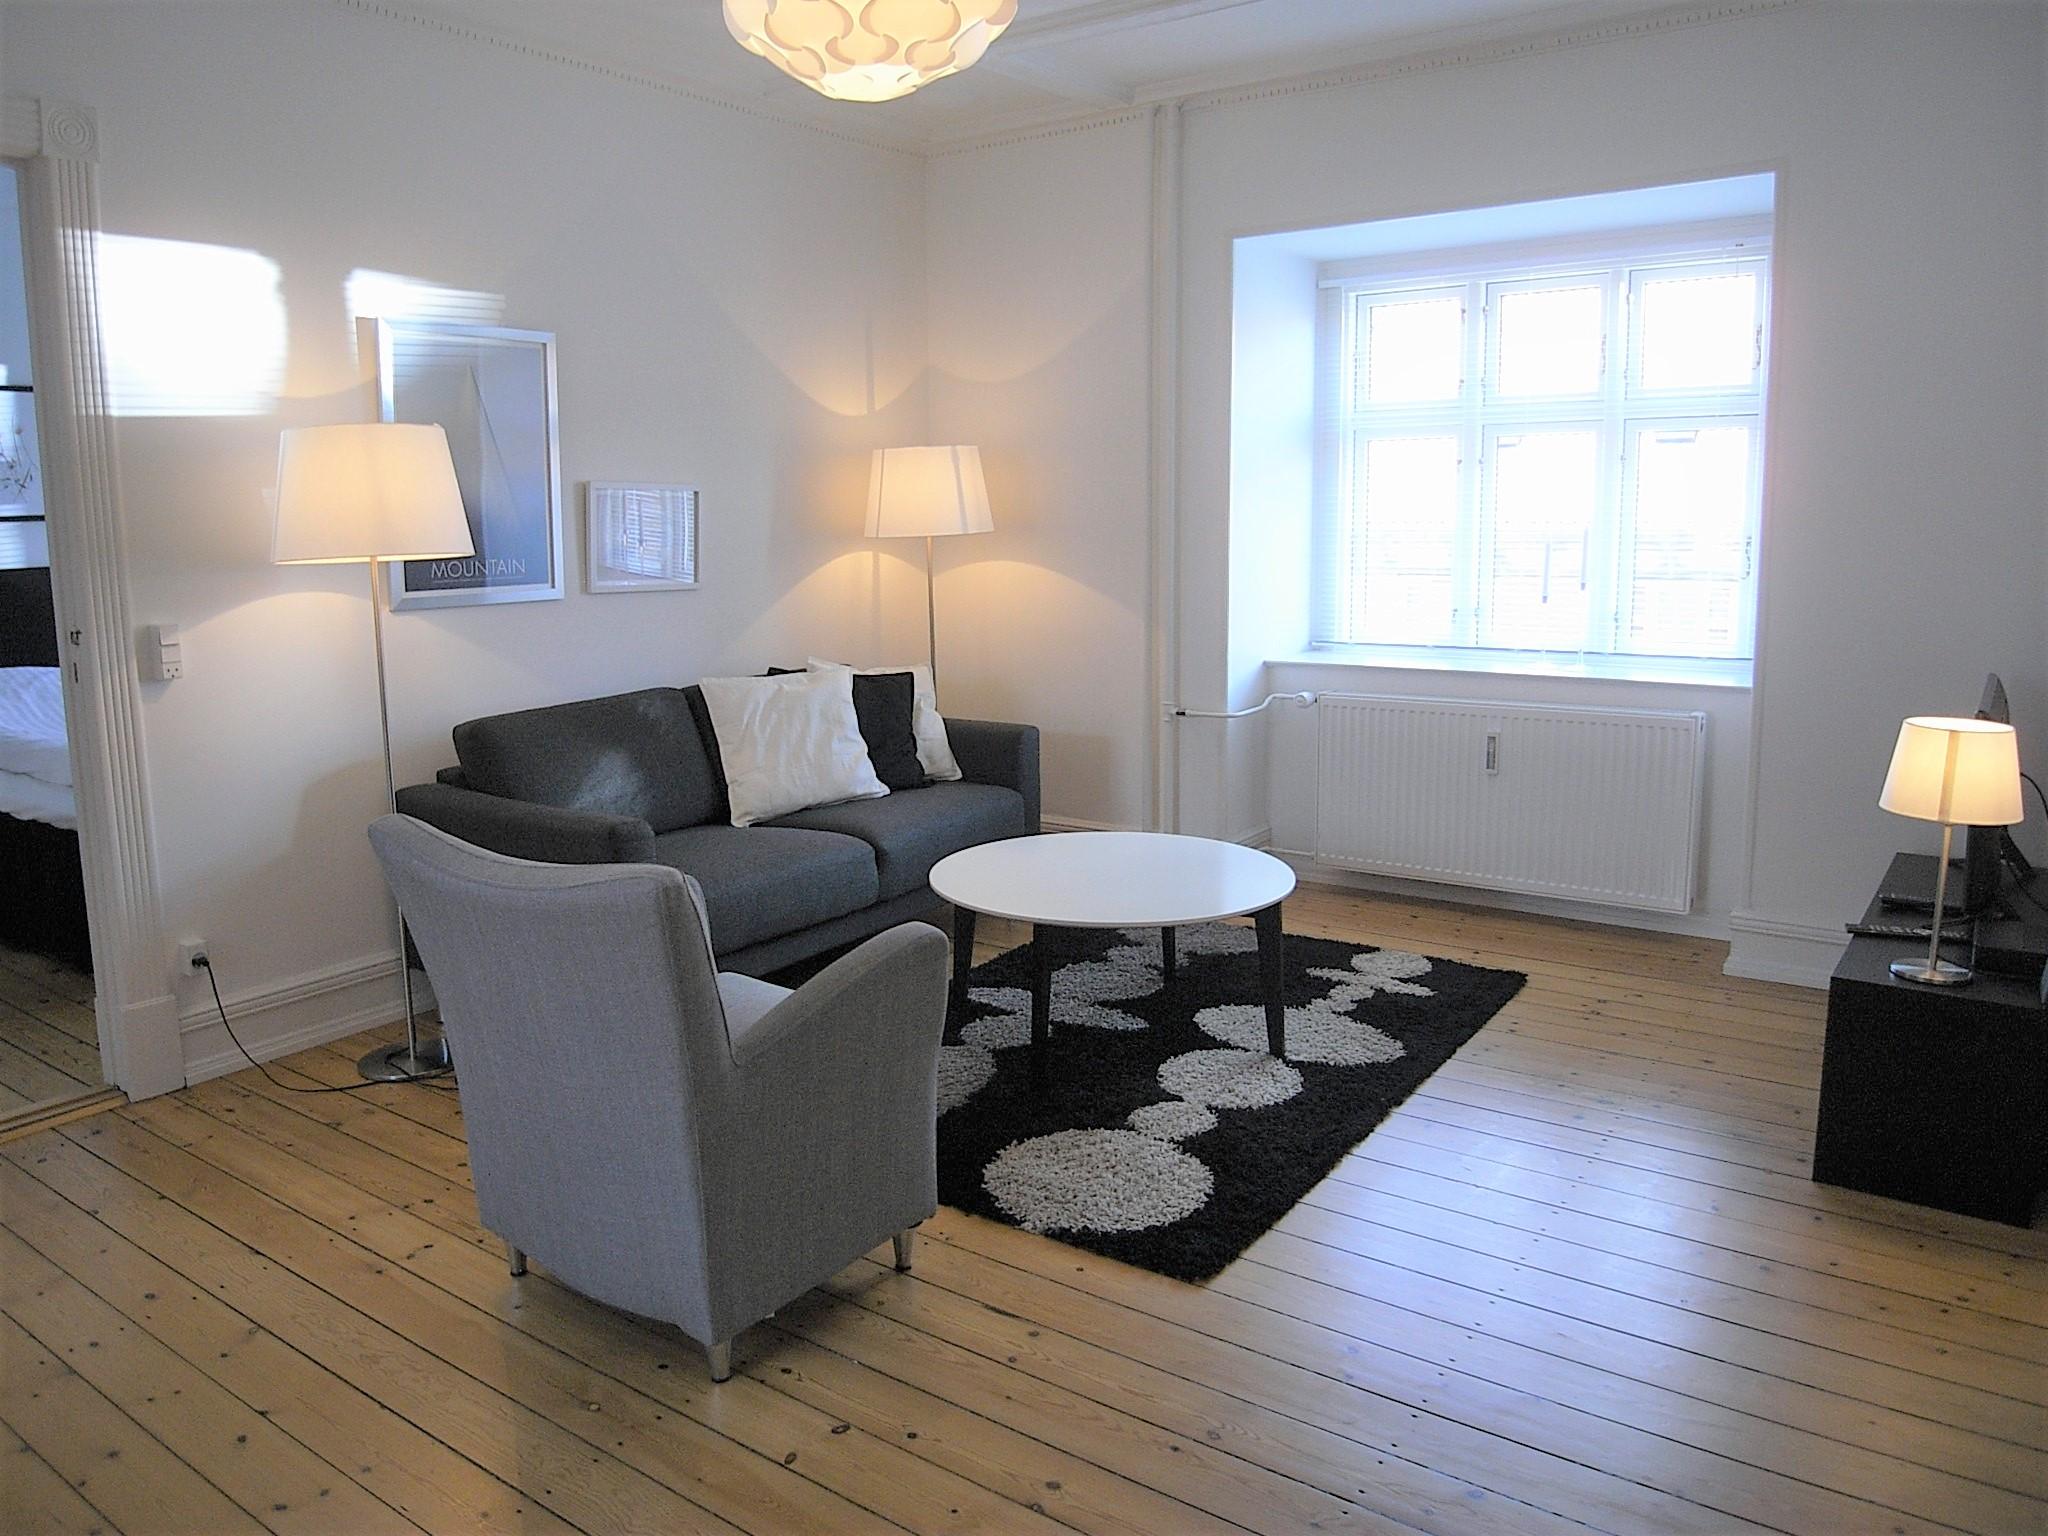 1269 – God lejlighed på Amagerbro – Q Living Copenhagen